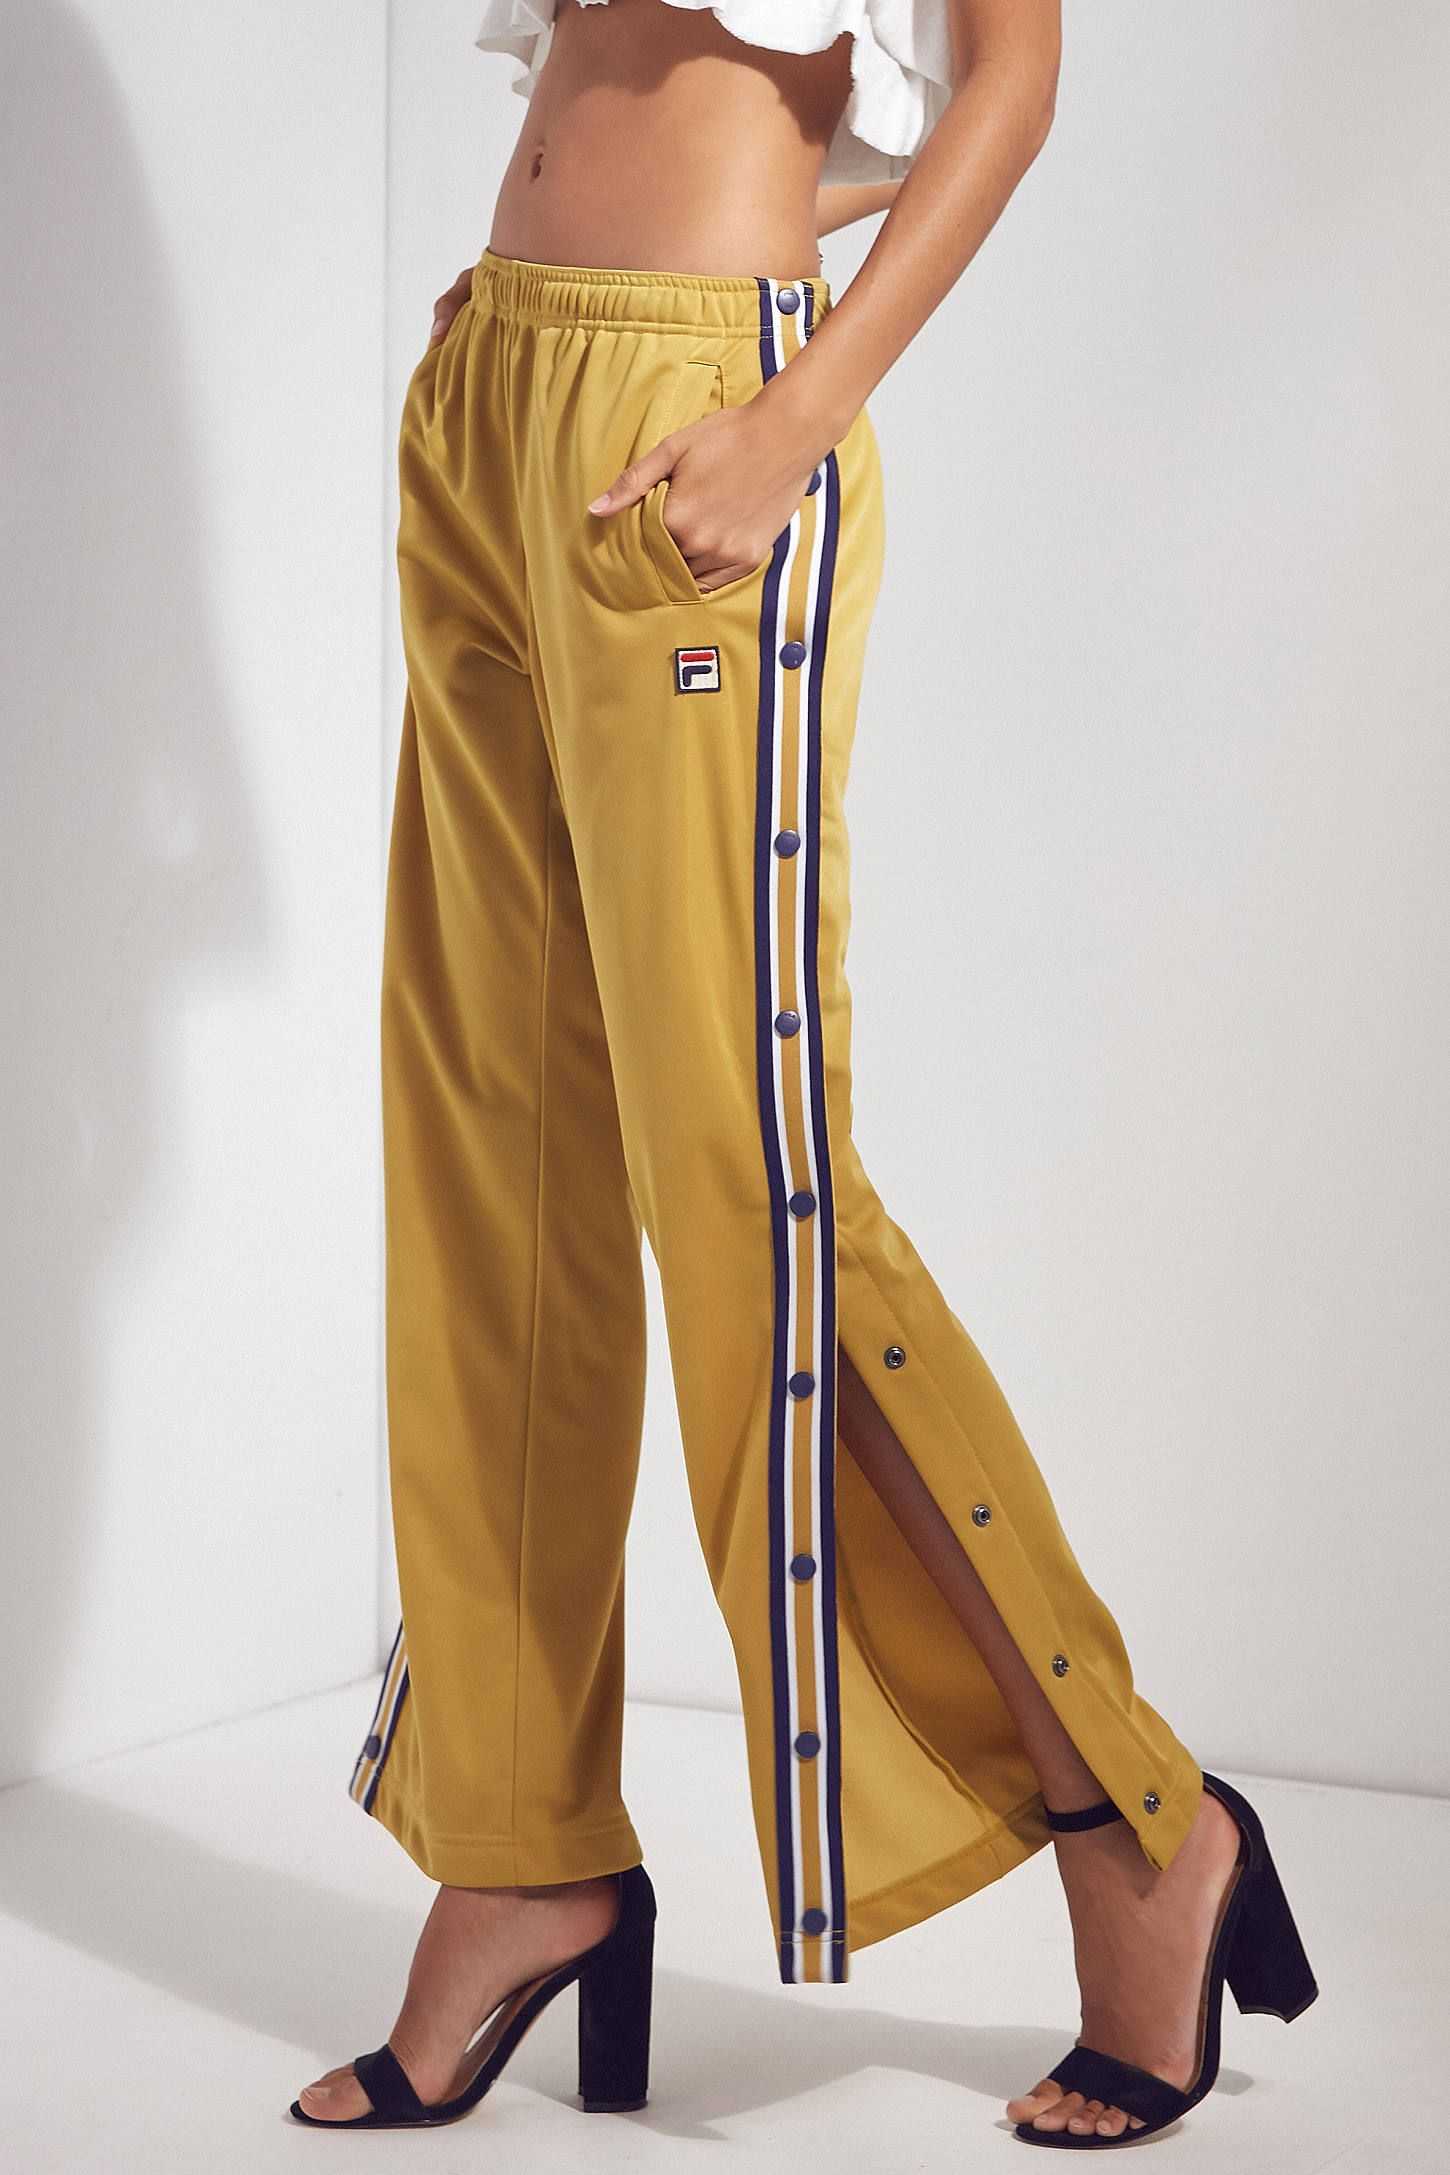 Fila Tearaway Pinterest Track Lauren Whiplash Basketball Pants Uo rZwrqB4